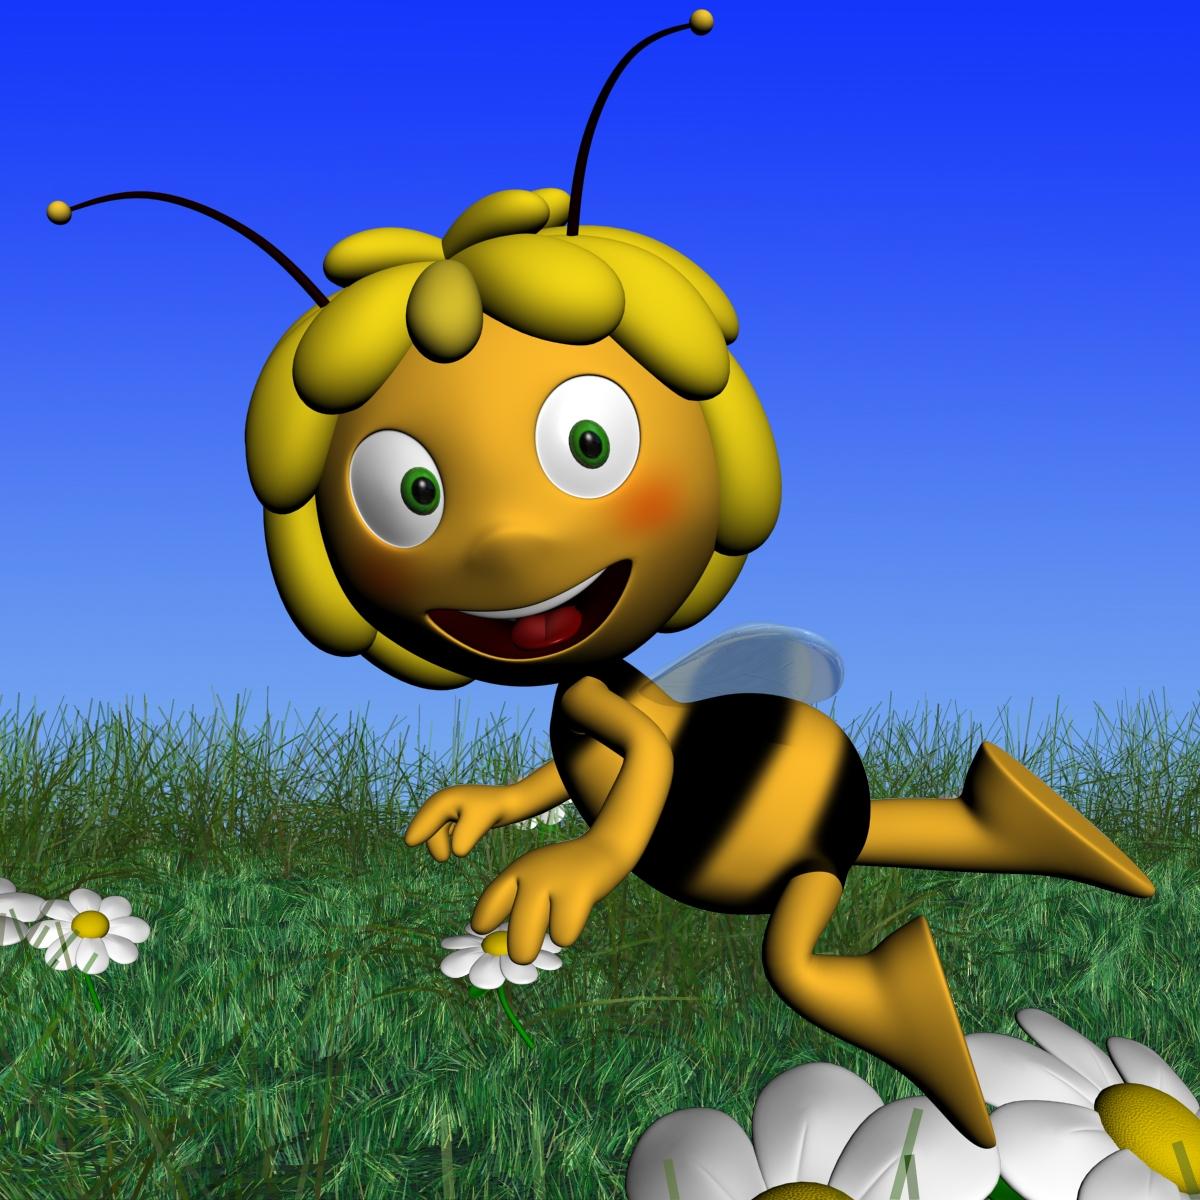 maya пчела монтирани 3d модел 3ds макс fbx obj 170687